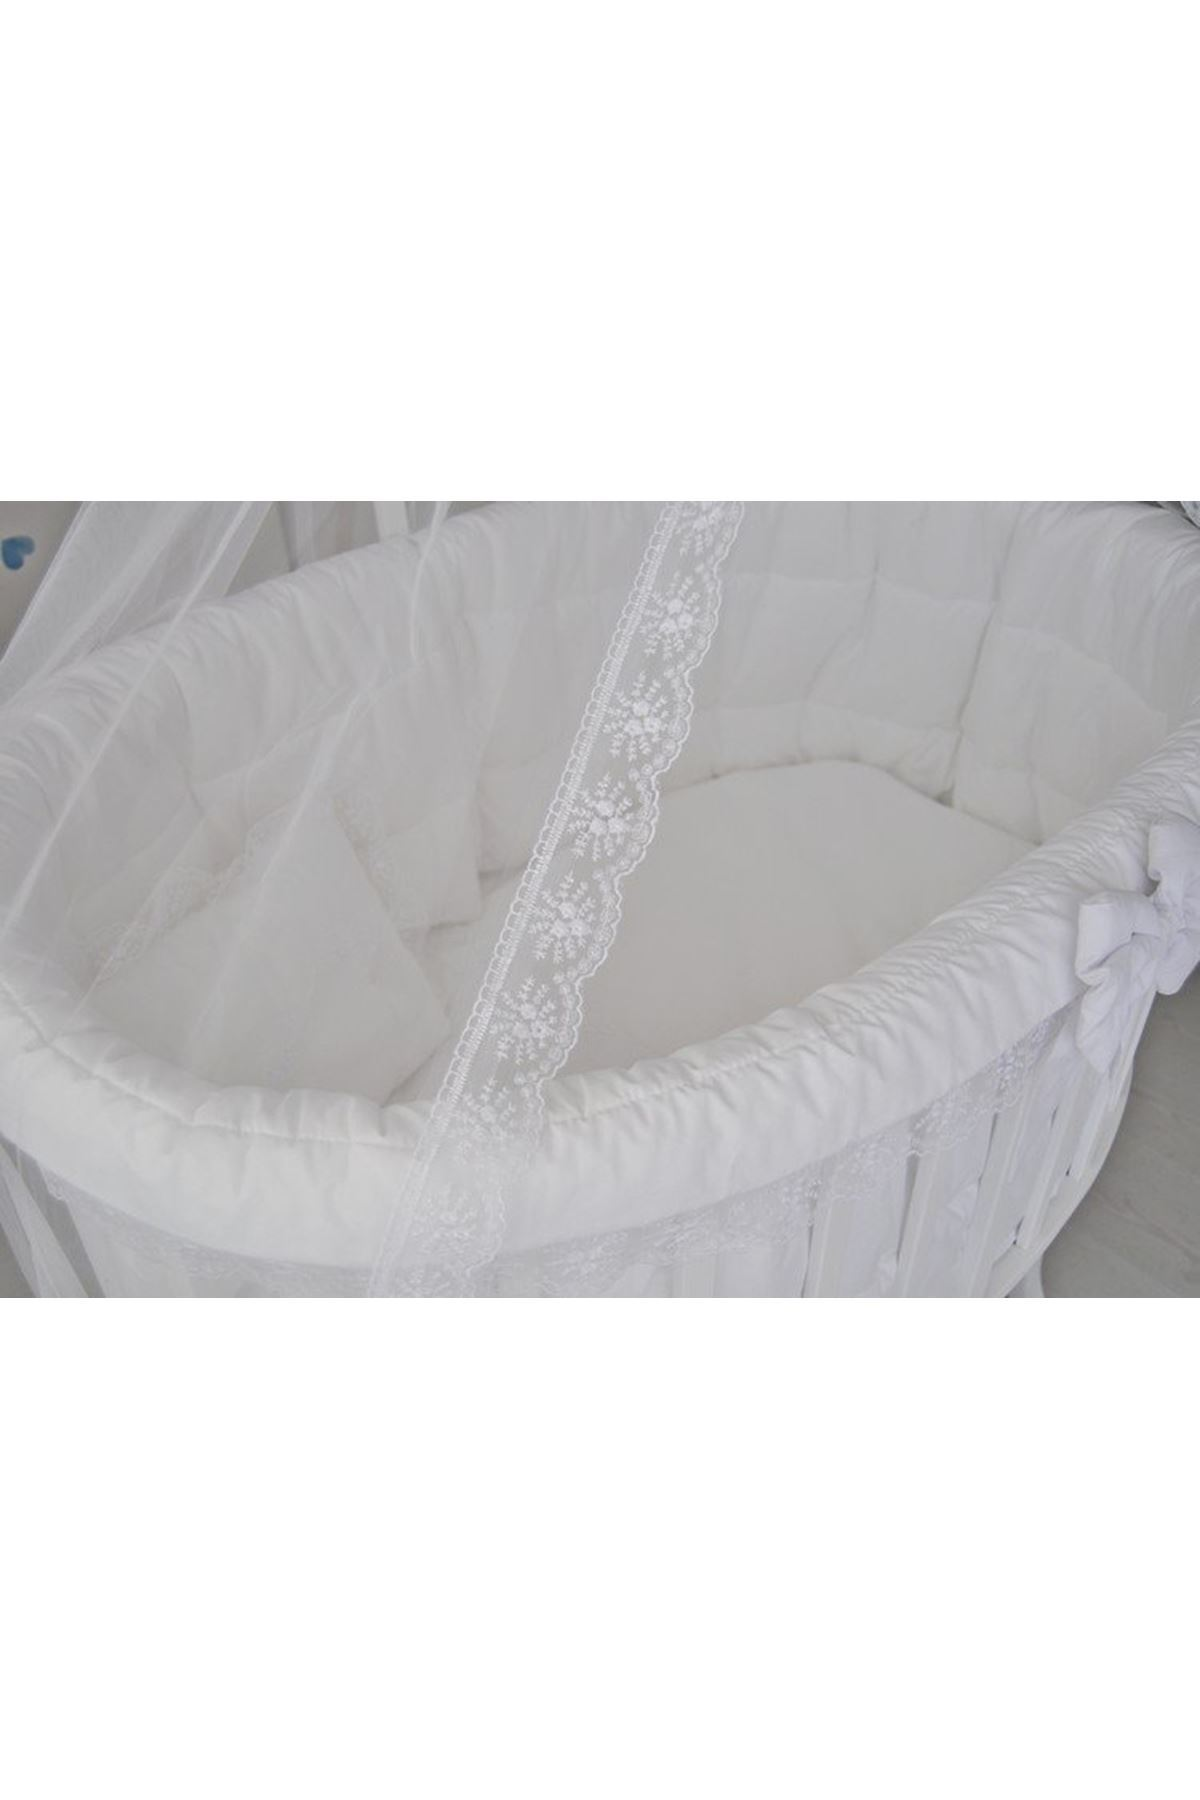 White Basket Crib White French Lace Cover Set